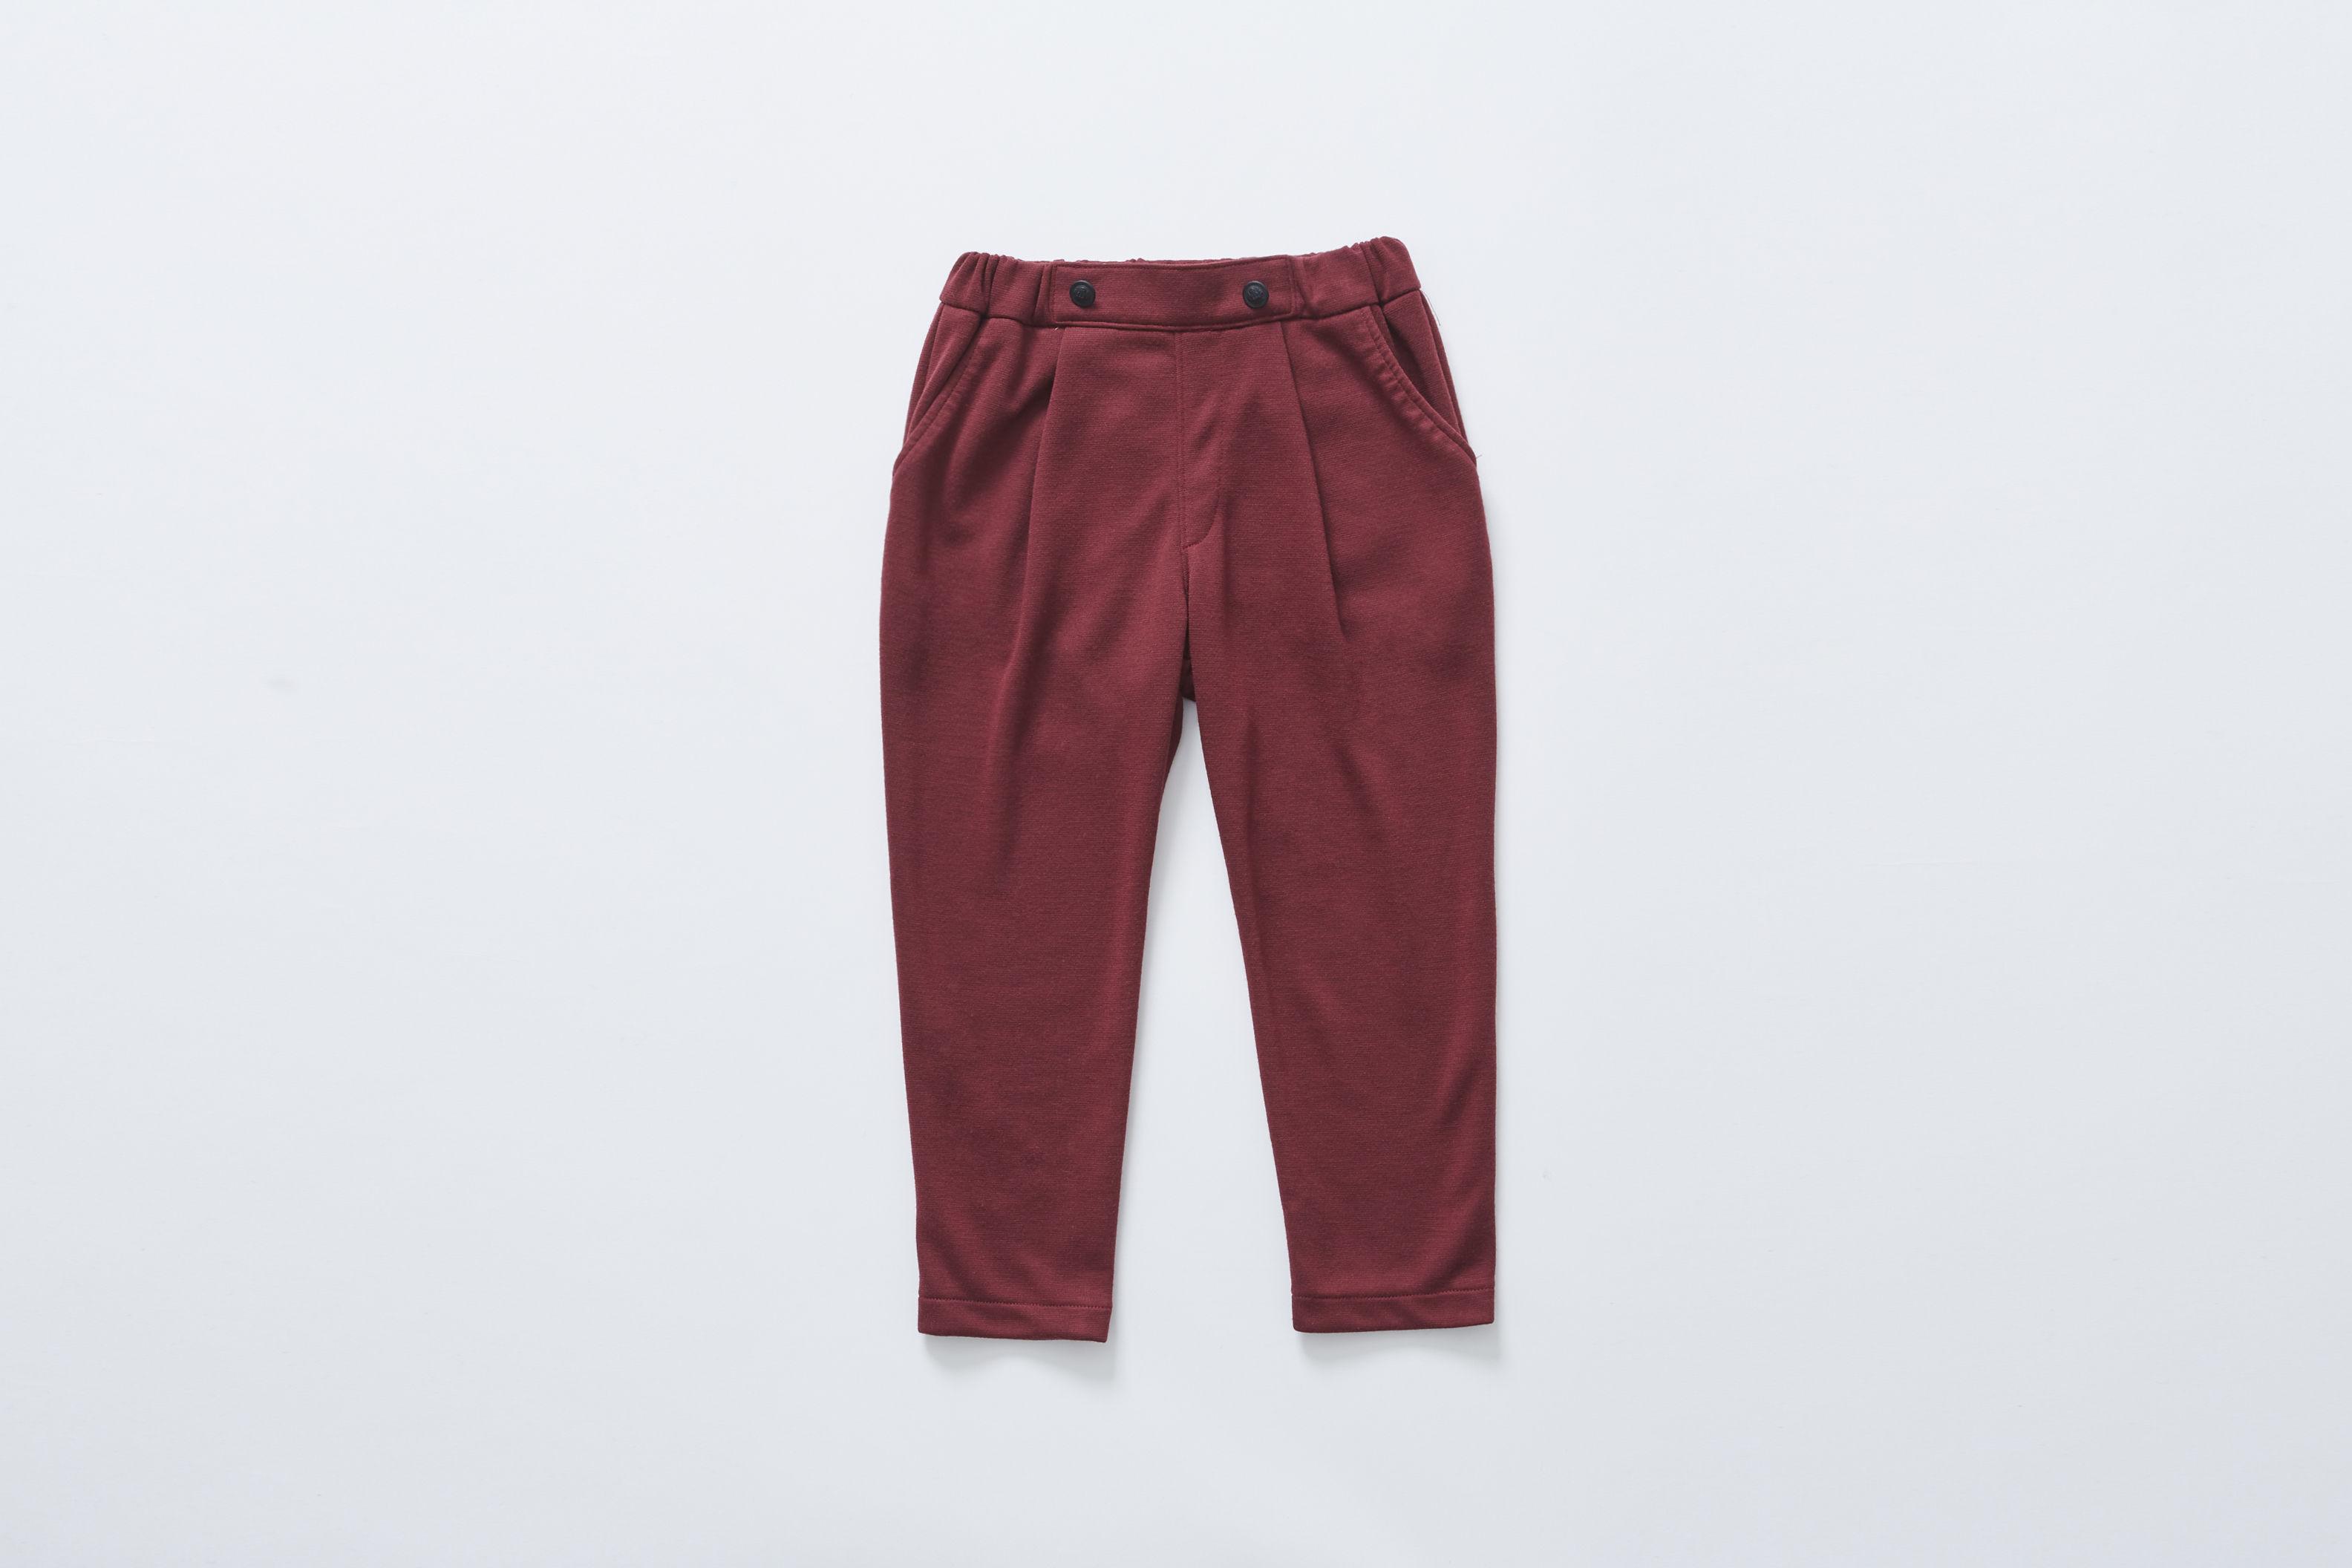 【cokitica 2017AW】cka-172J26 ponte knit pants / burgundy / 110-130cm